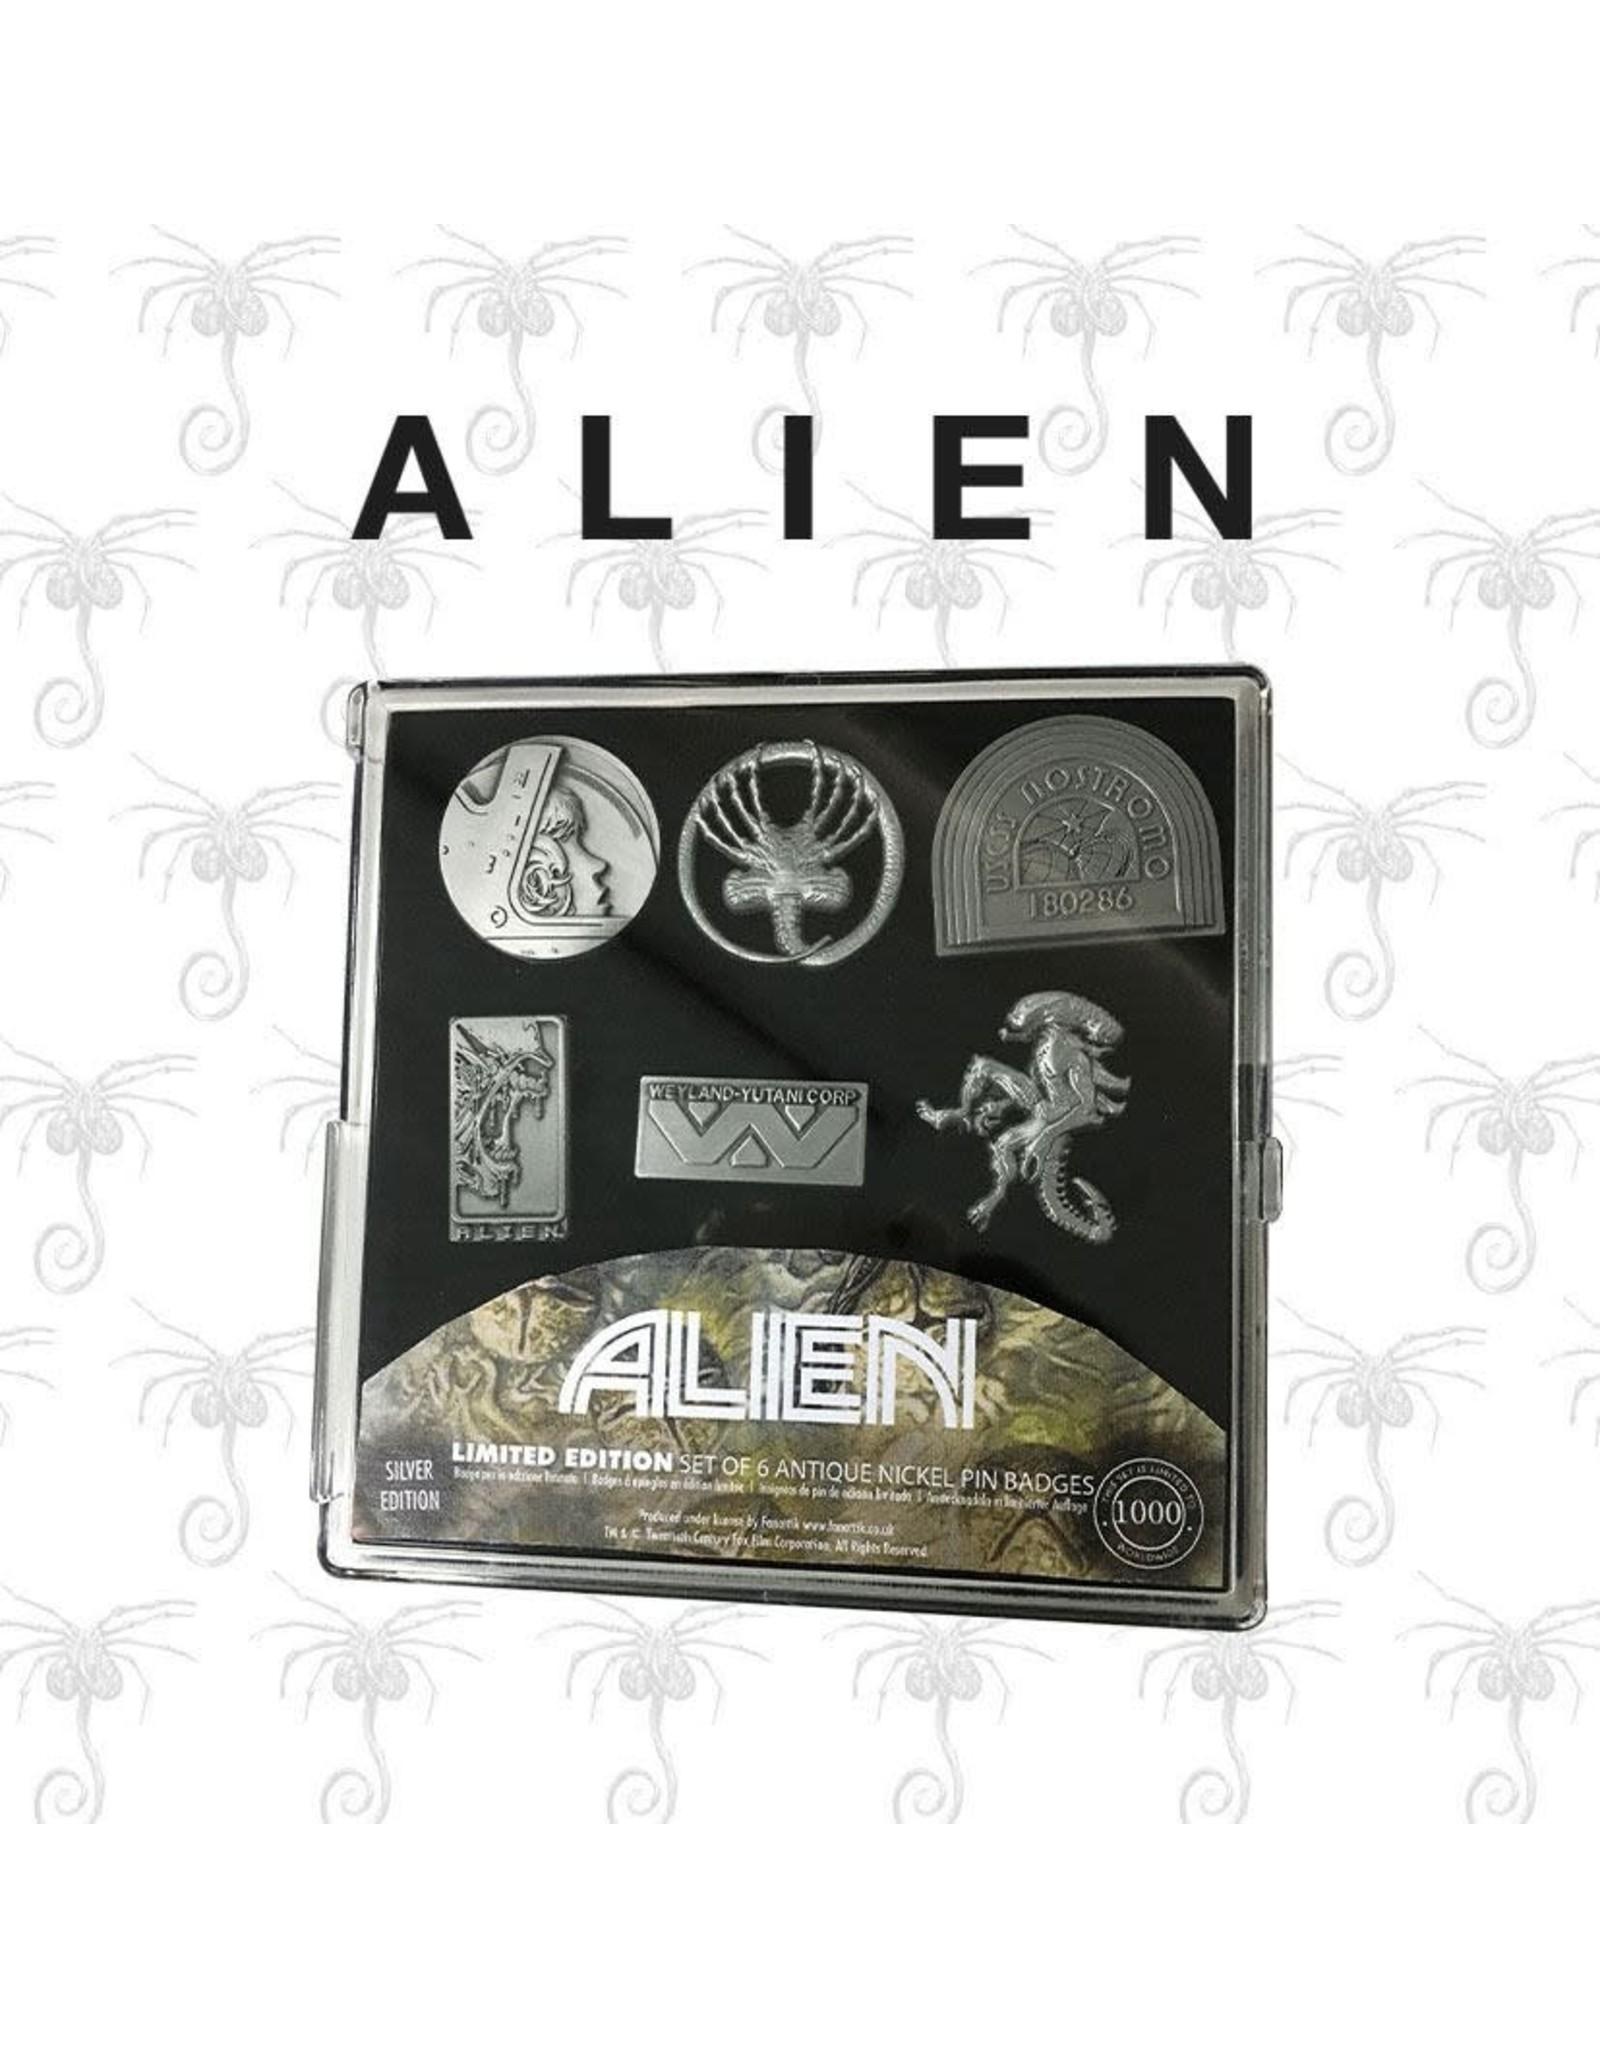 FaNaTtik ALIEN 6-Pack Pins - Limited Edition